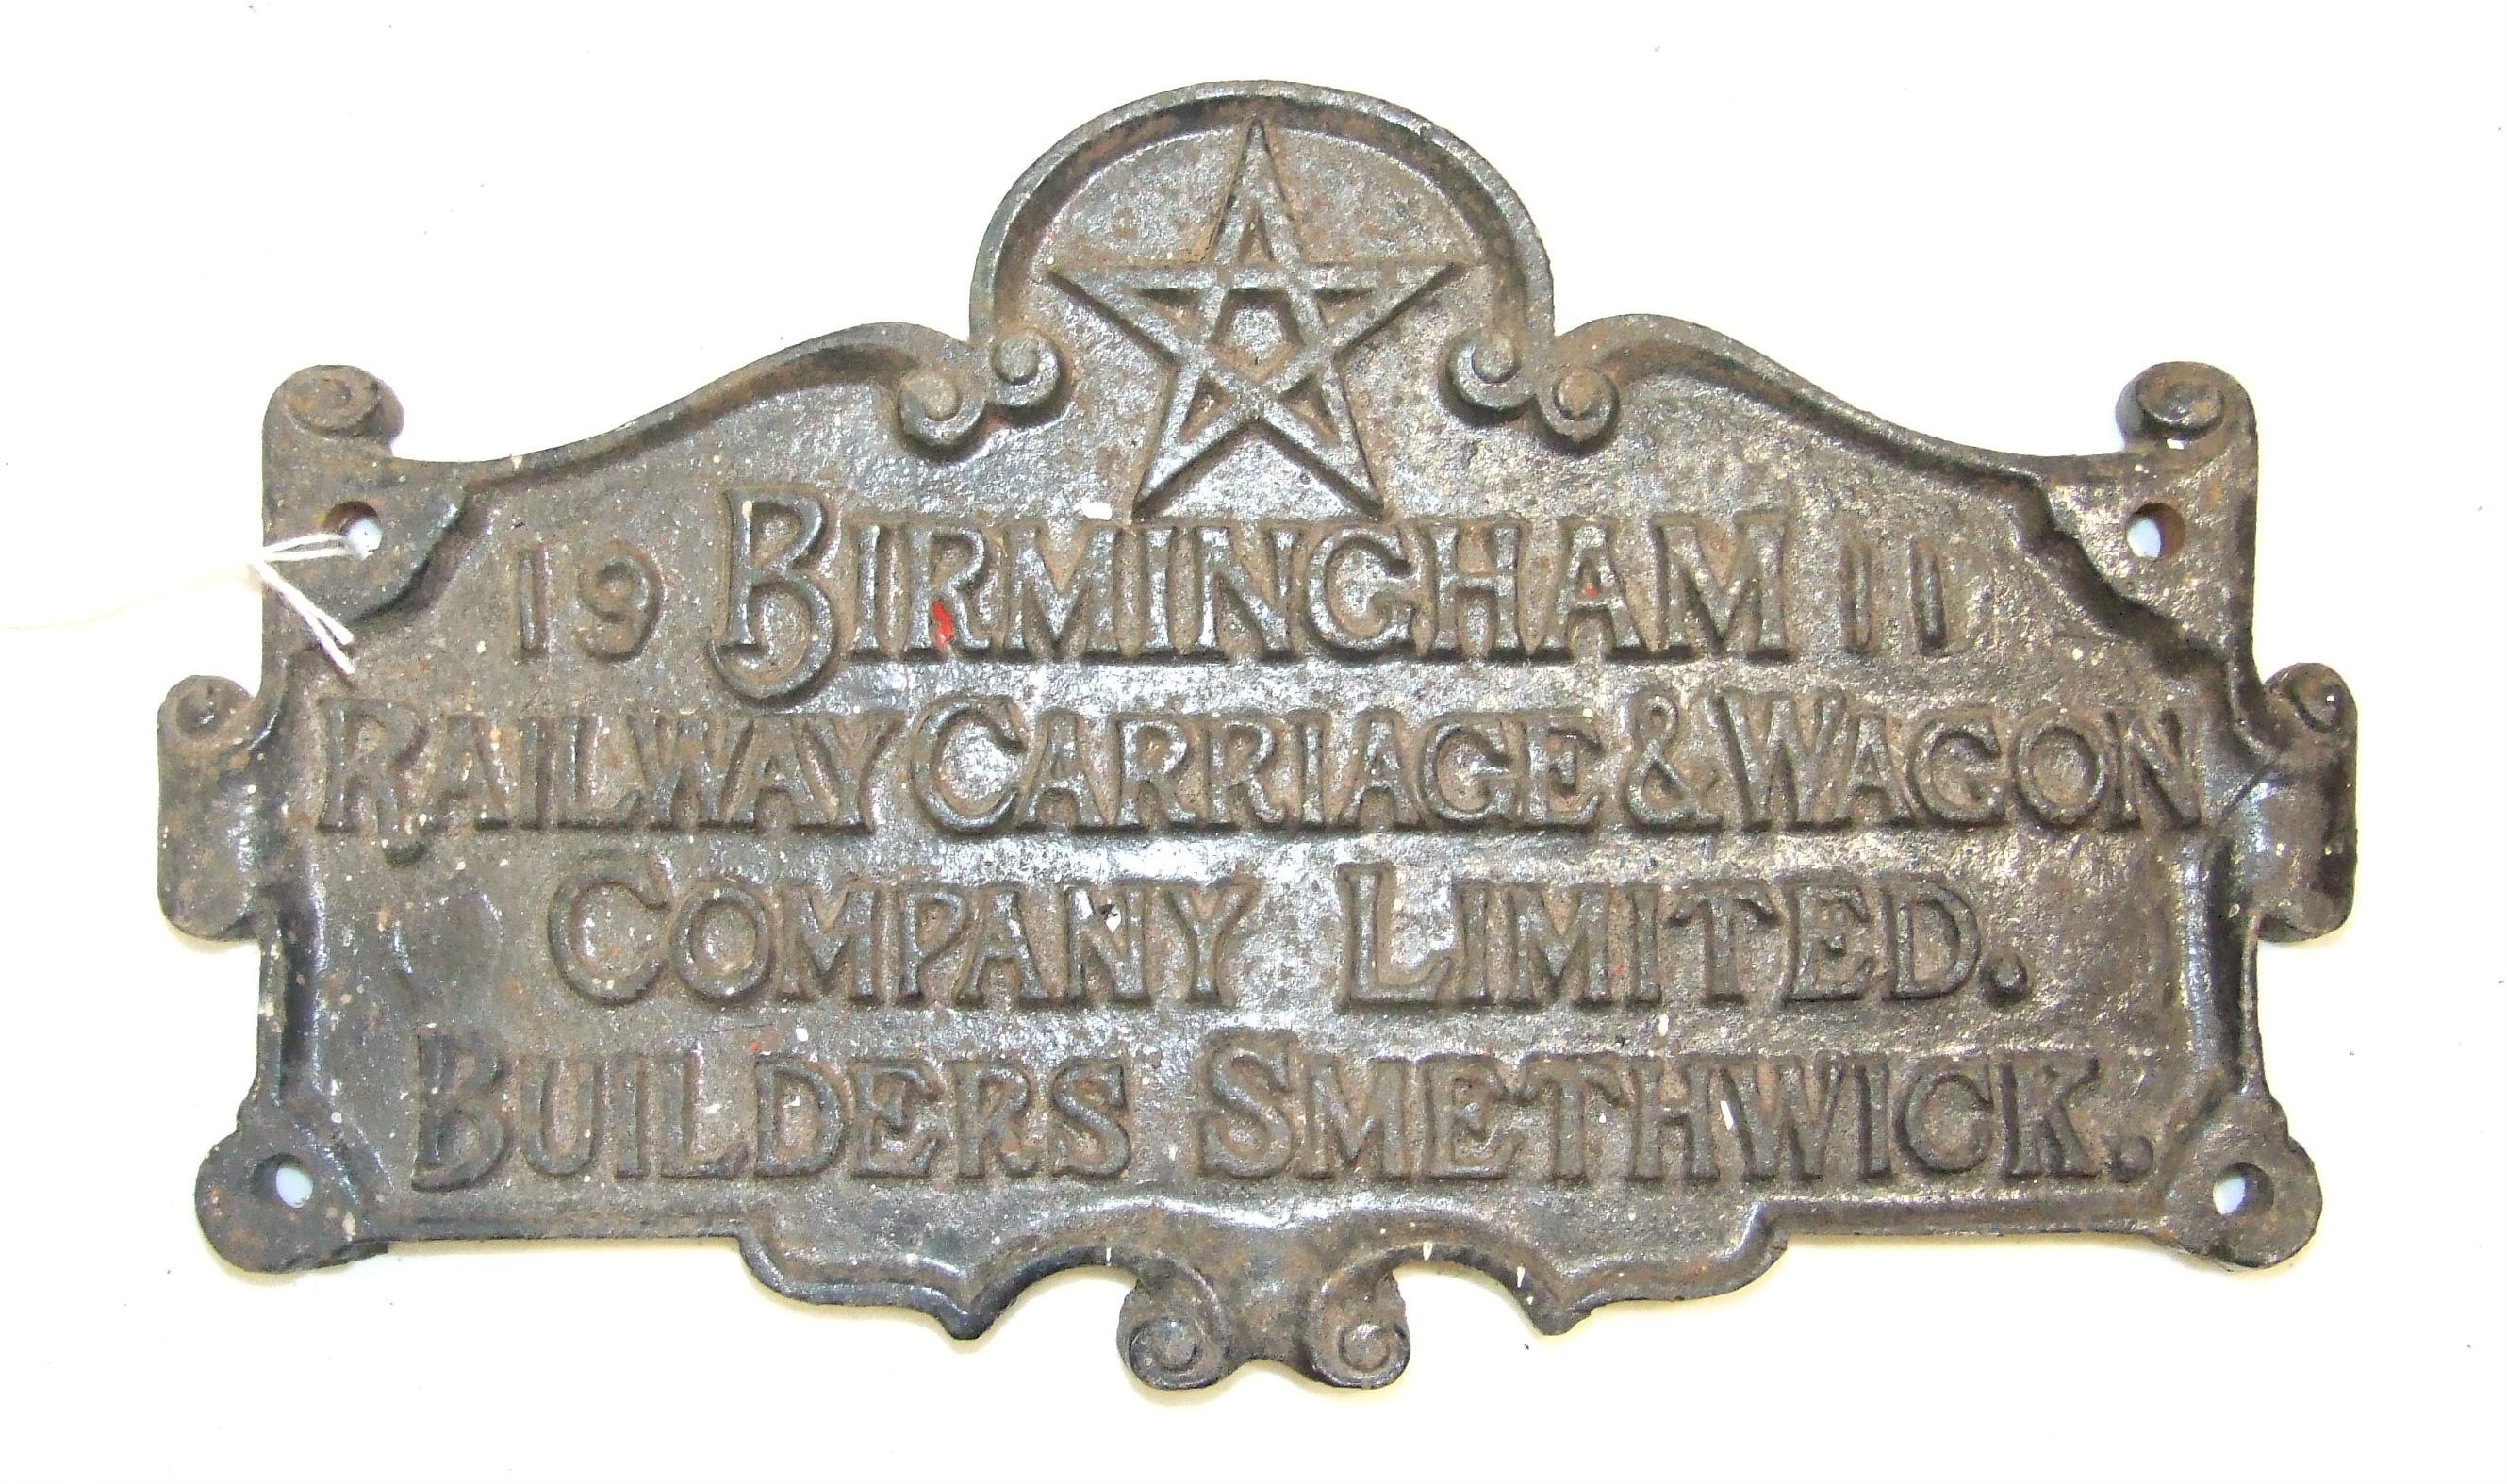 "Lot 457A - A cast iron carriage plate ""Birmingham Railway & Wagon Company Limited, Builders Smethwick""."